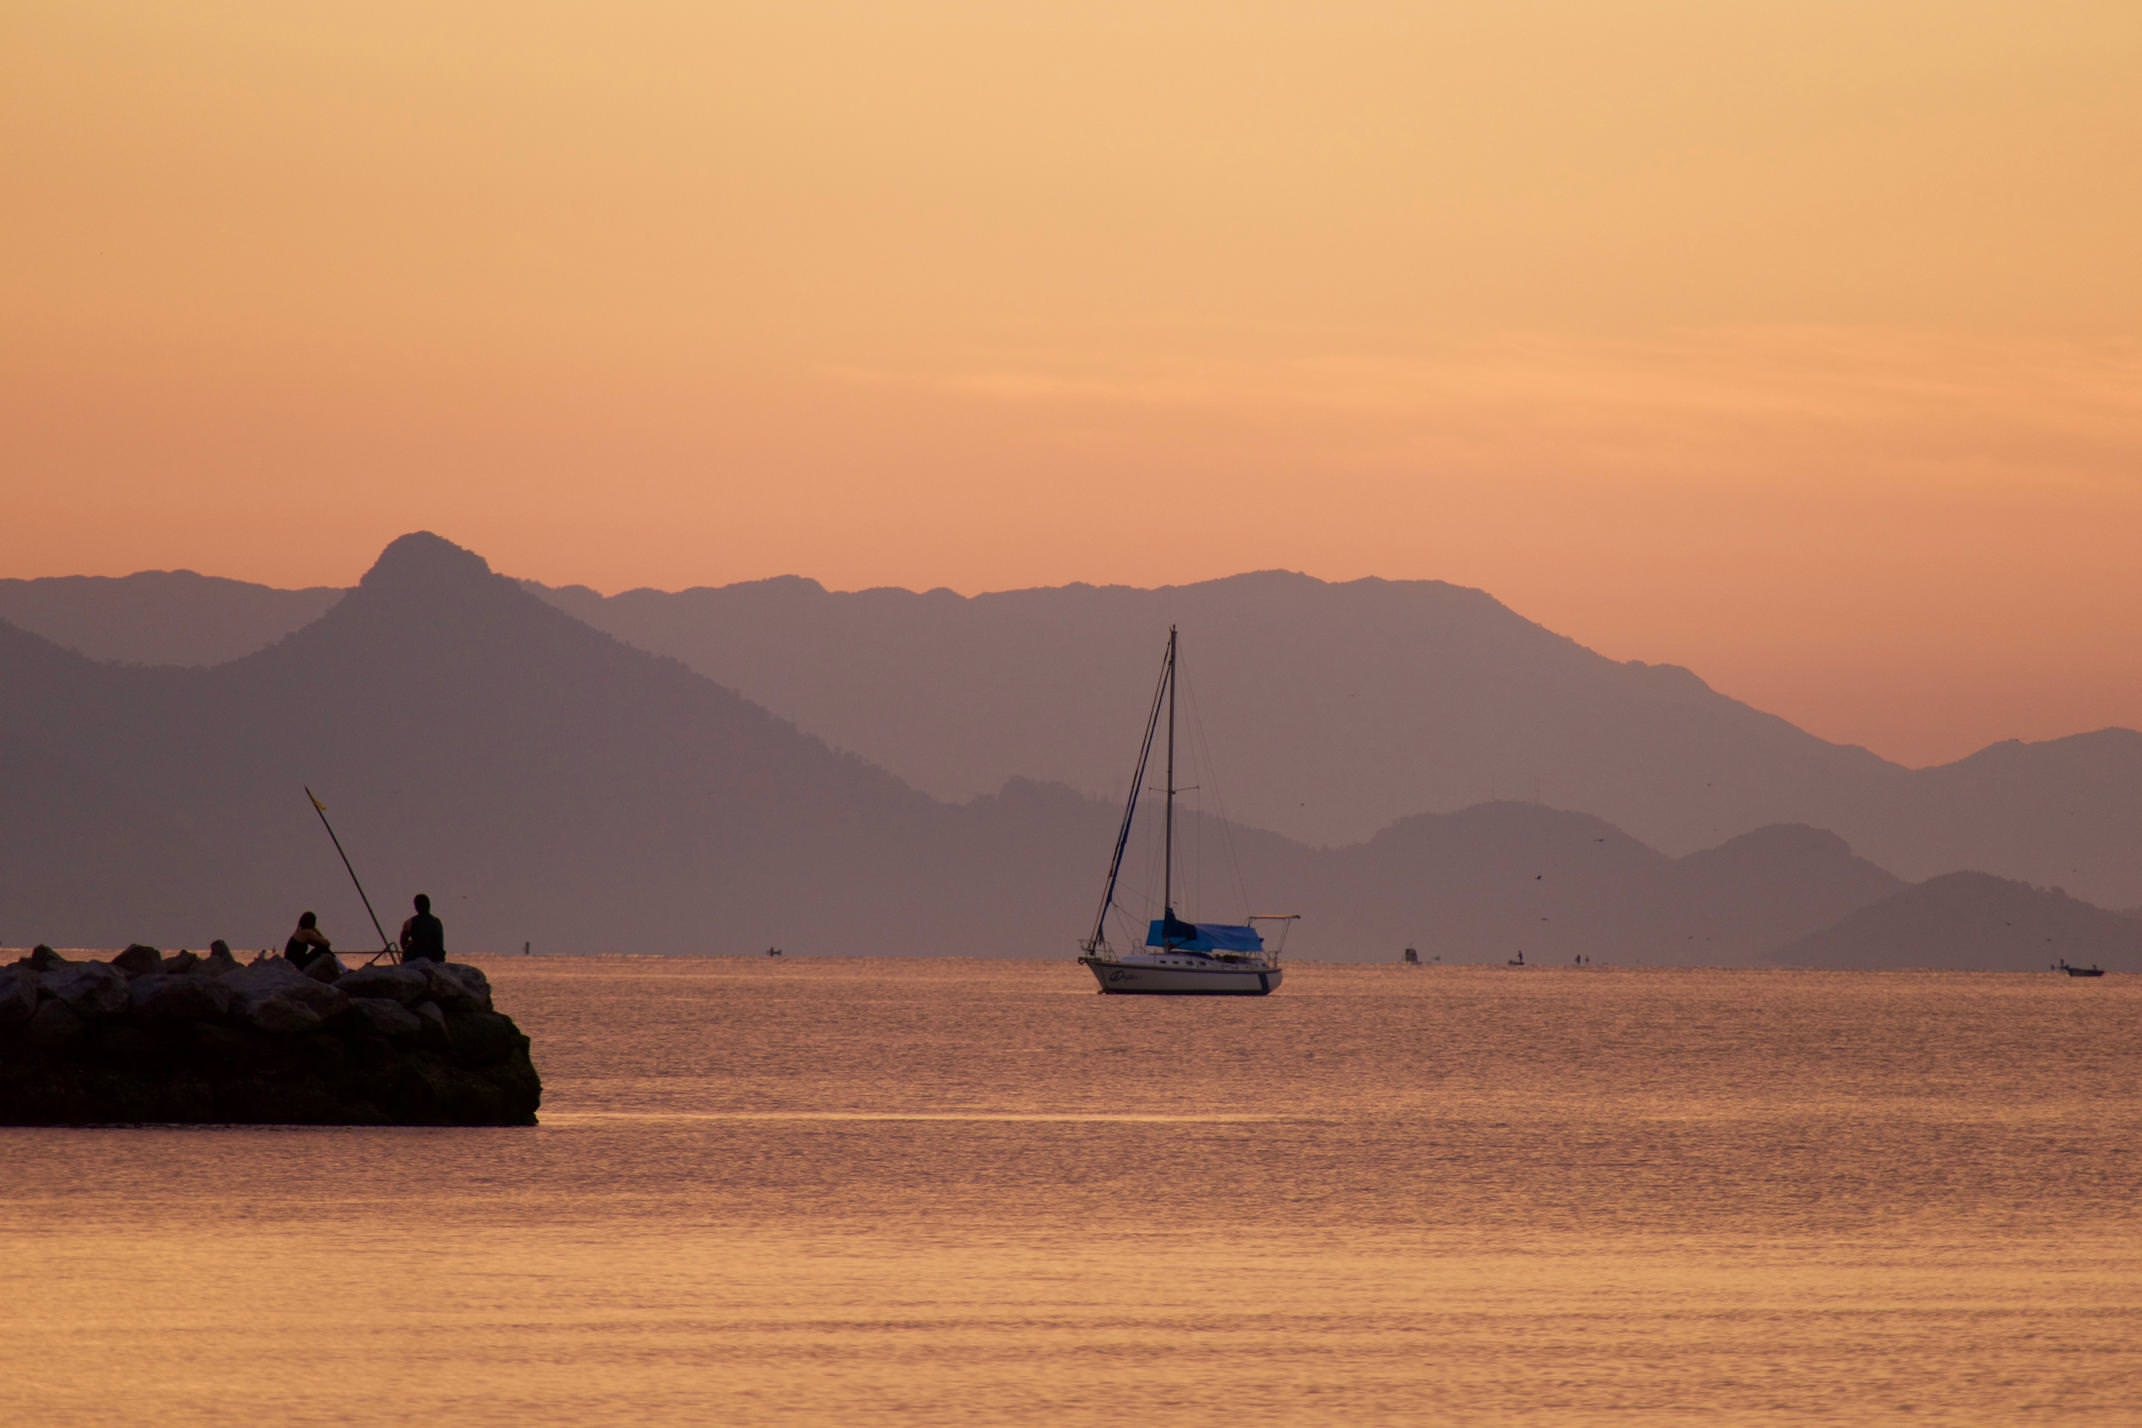 Brazil paraty sunrise over bay copyright pura aventura thomas power